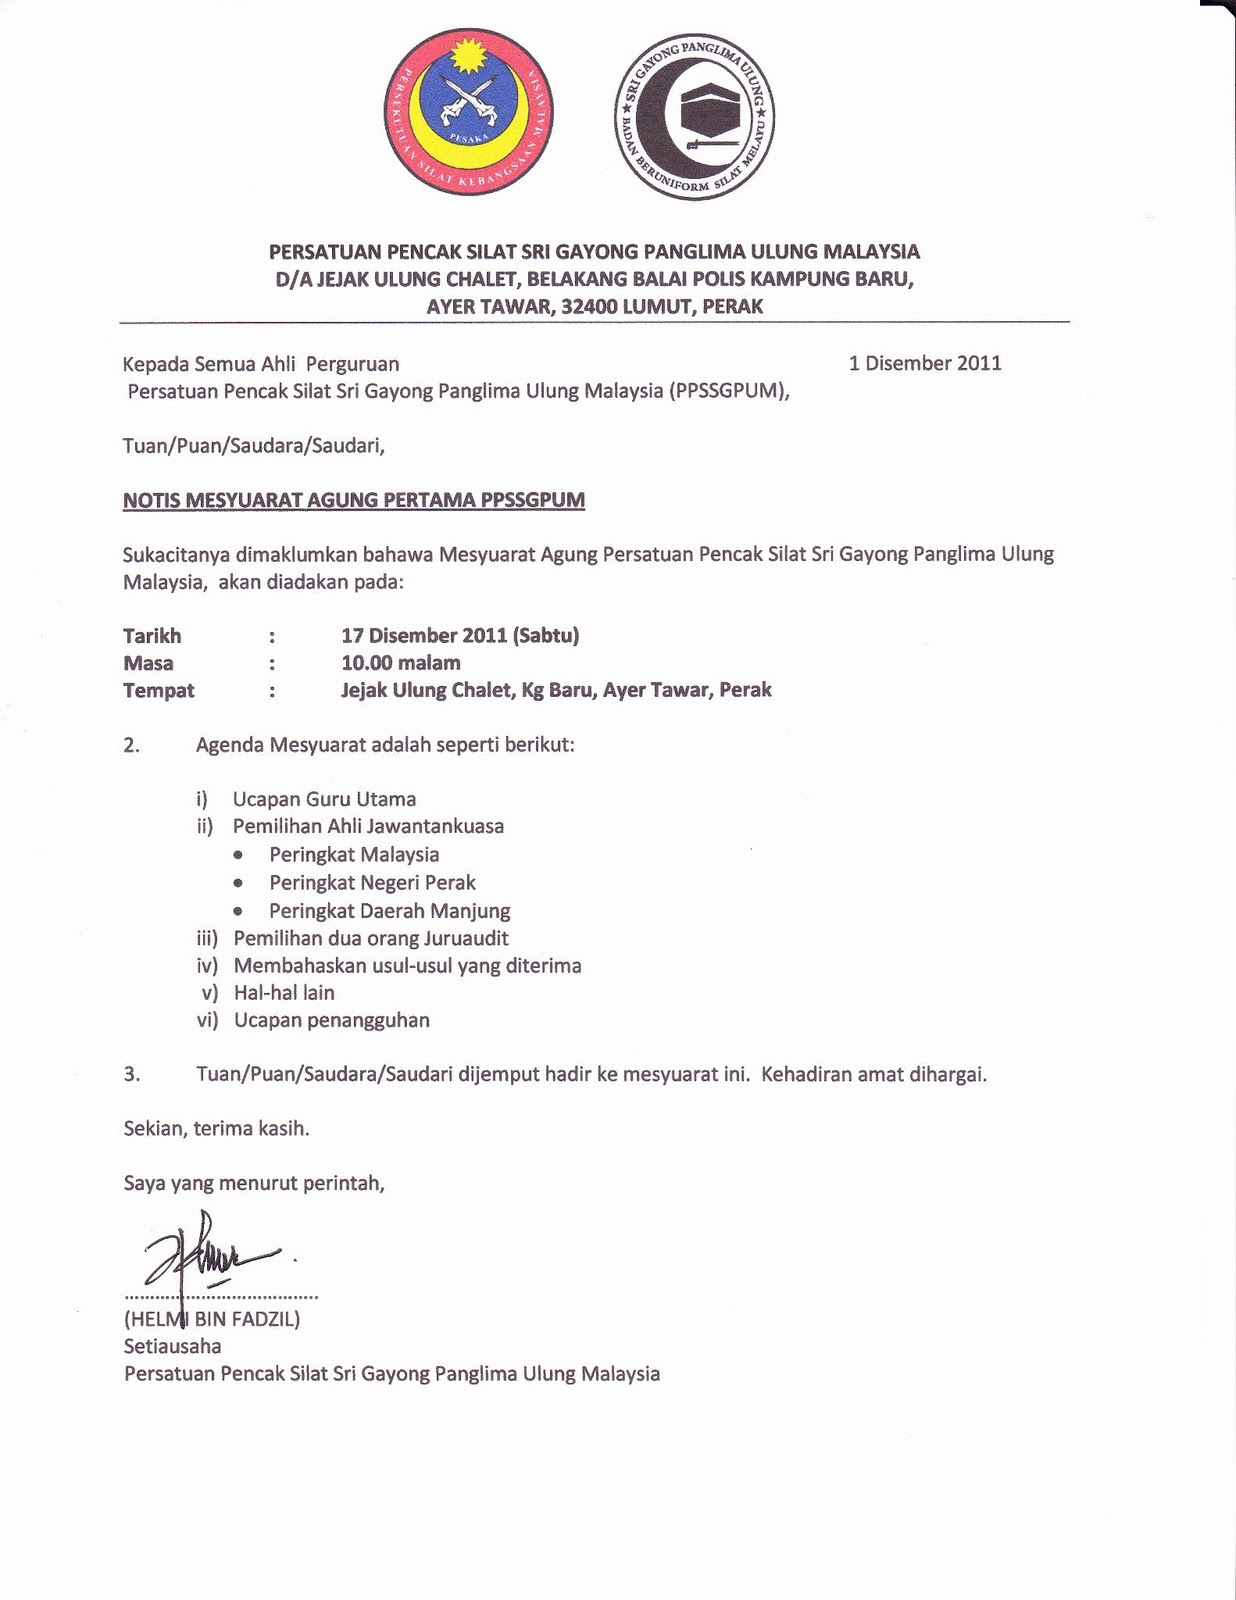 Contoh Surat Pernyataan Anneahiracom Review Ebooks